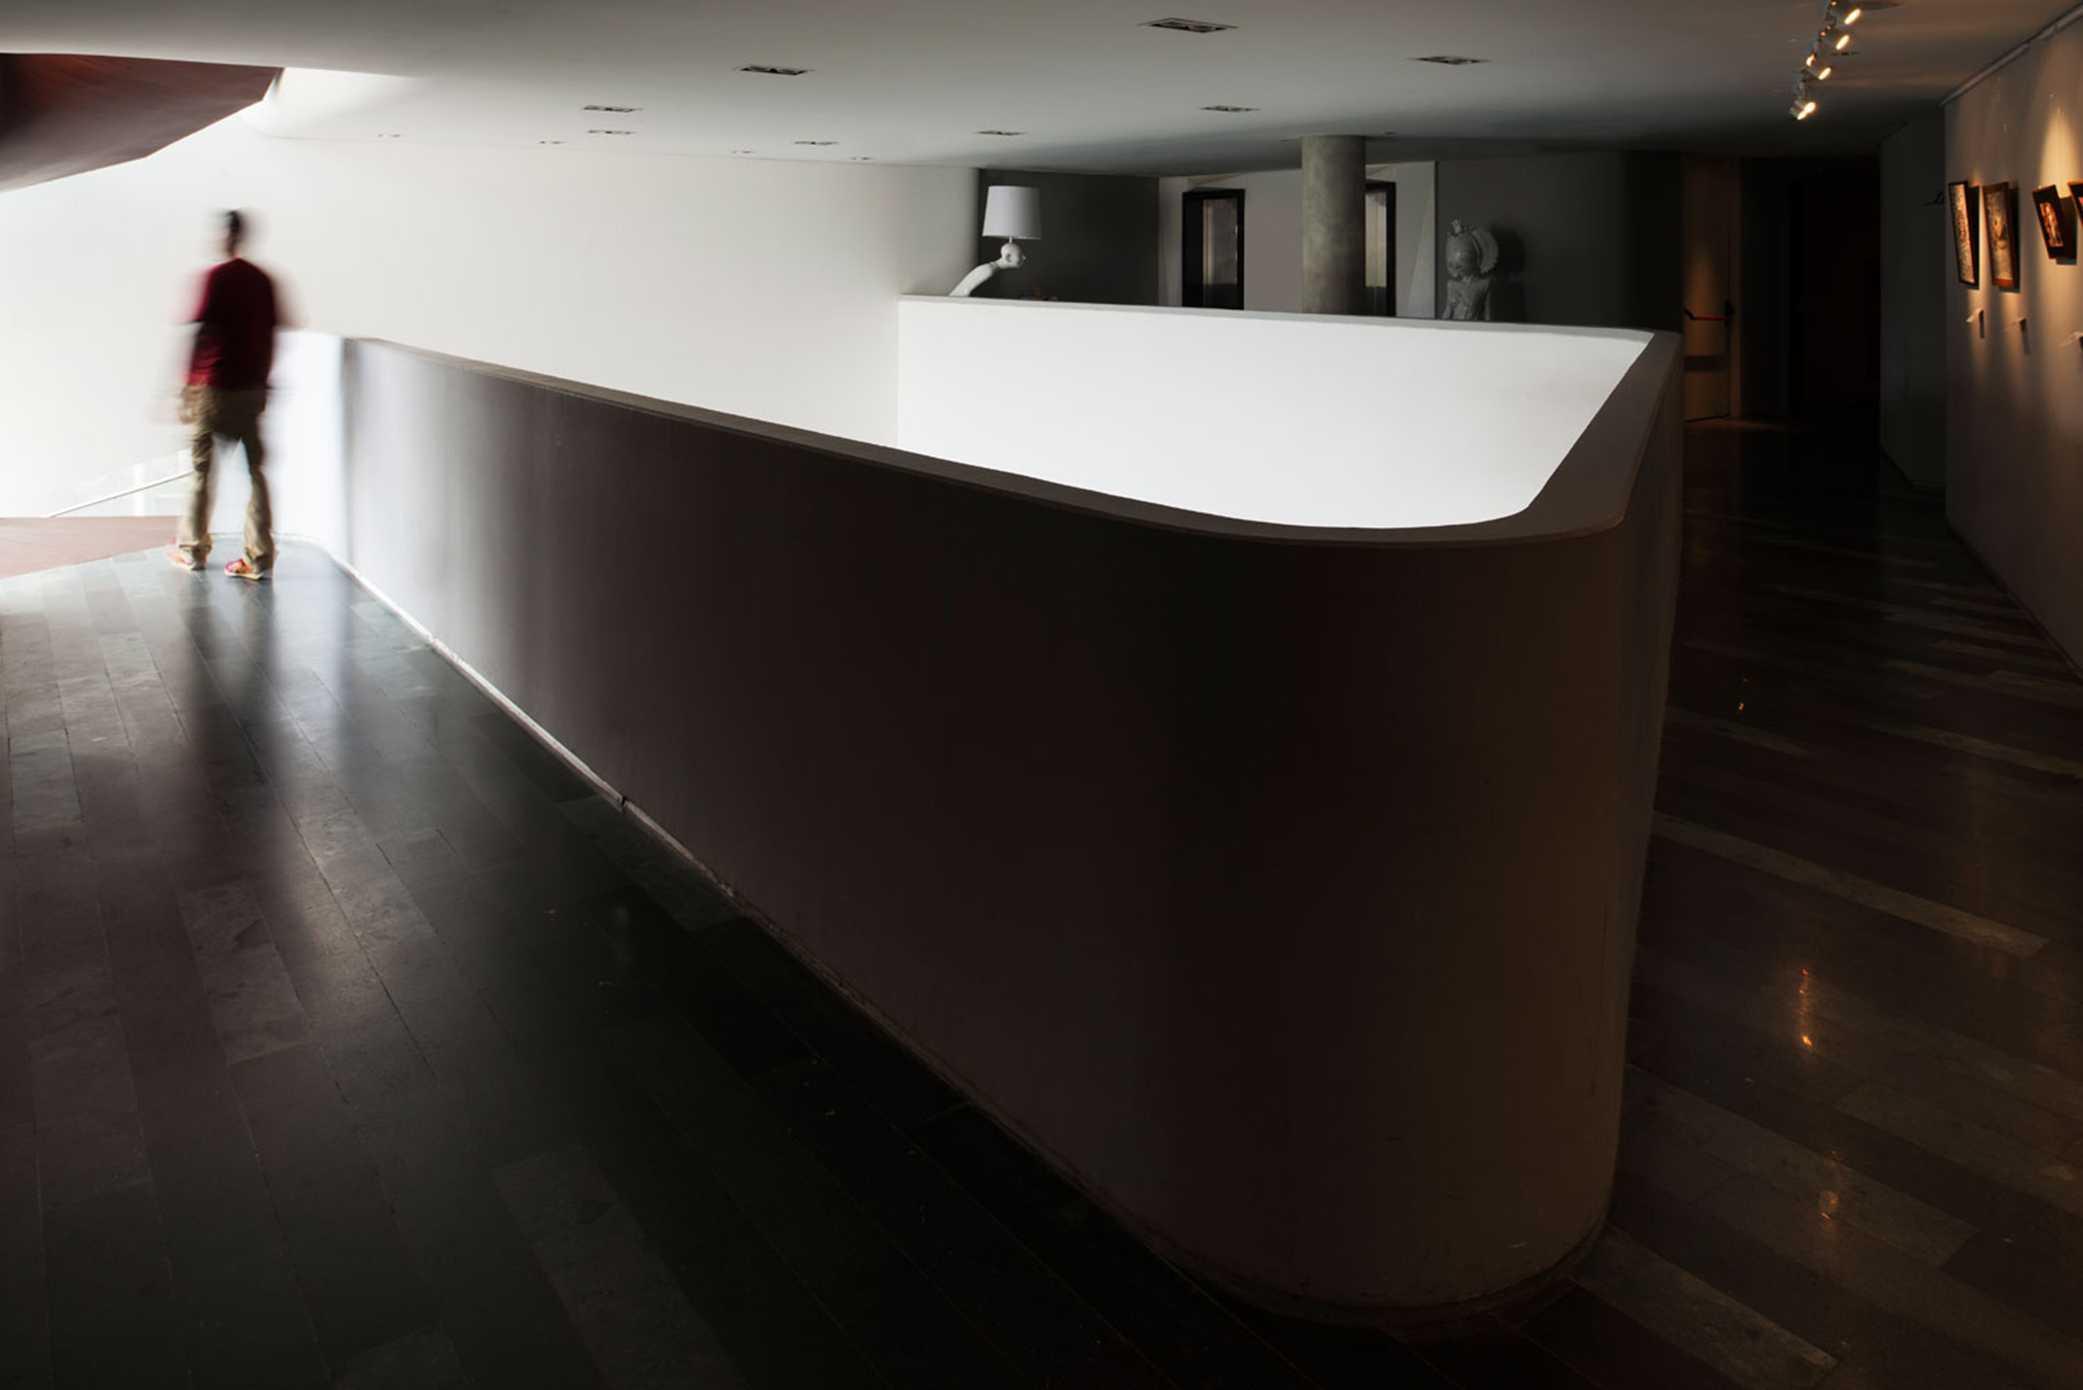 Aboday Architect Artotel Jakarta, Indonesia Jakarta, Indonesia Corridor Hotel Modern  15357